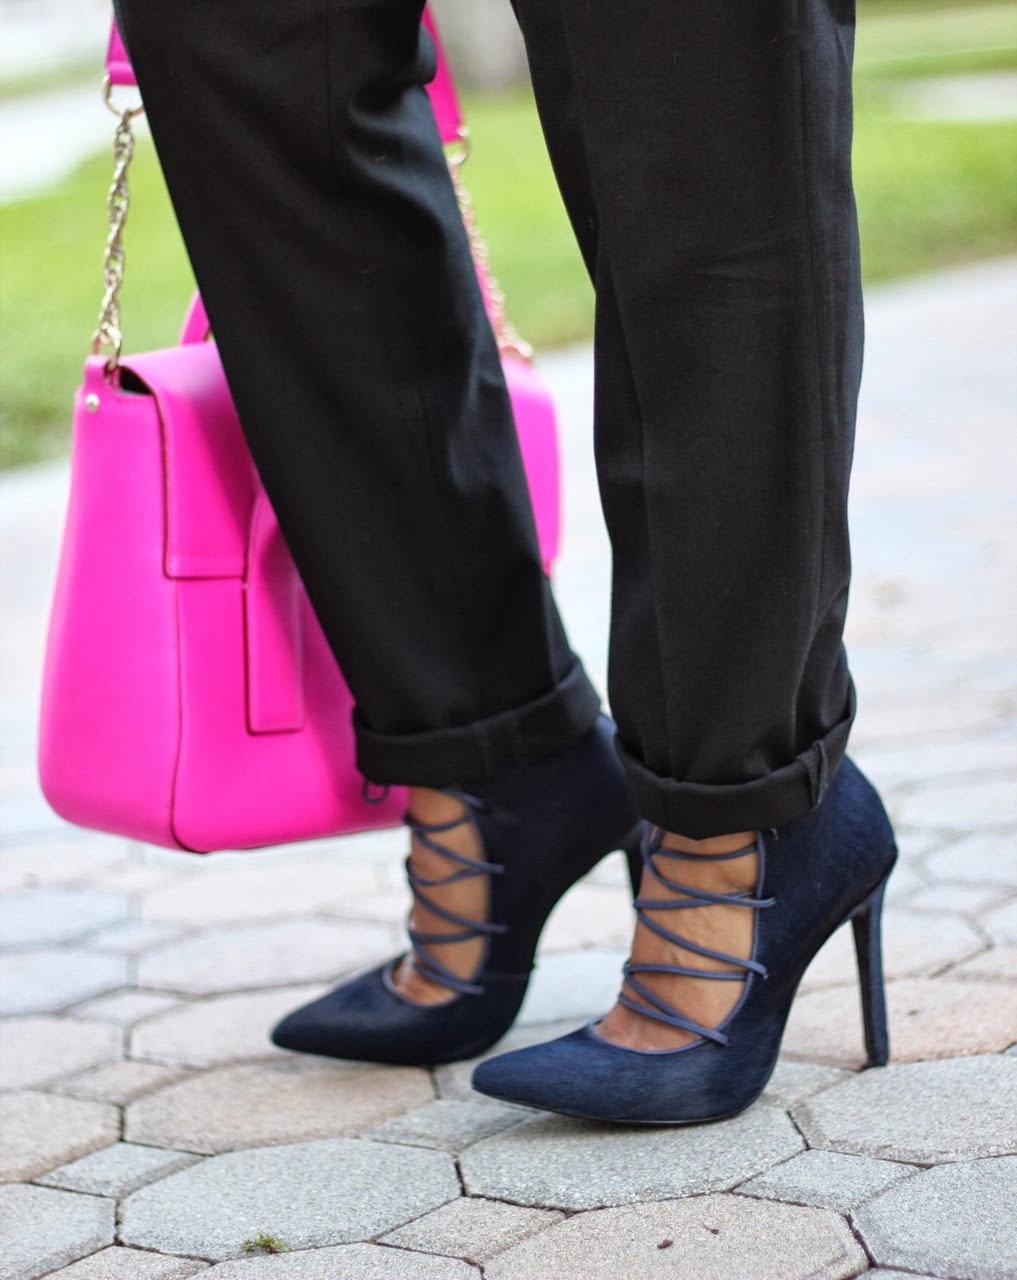 Gap plaid shirt ASOS pants shoes pumps lace up Schutz Alameda navy designer fur kate spade neon hot pink chloe sunglasses